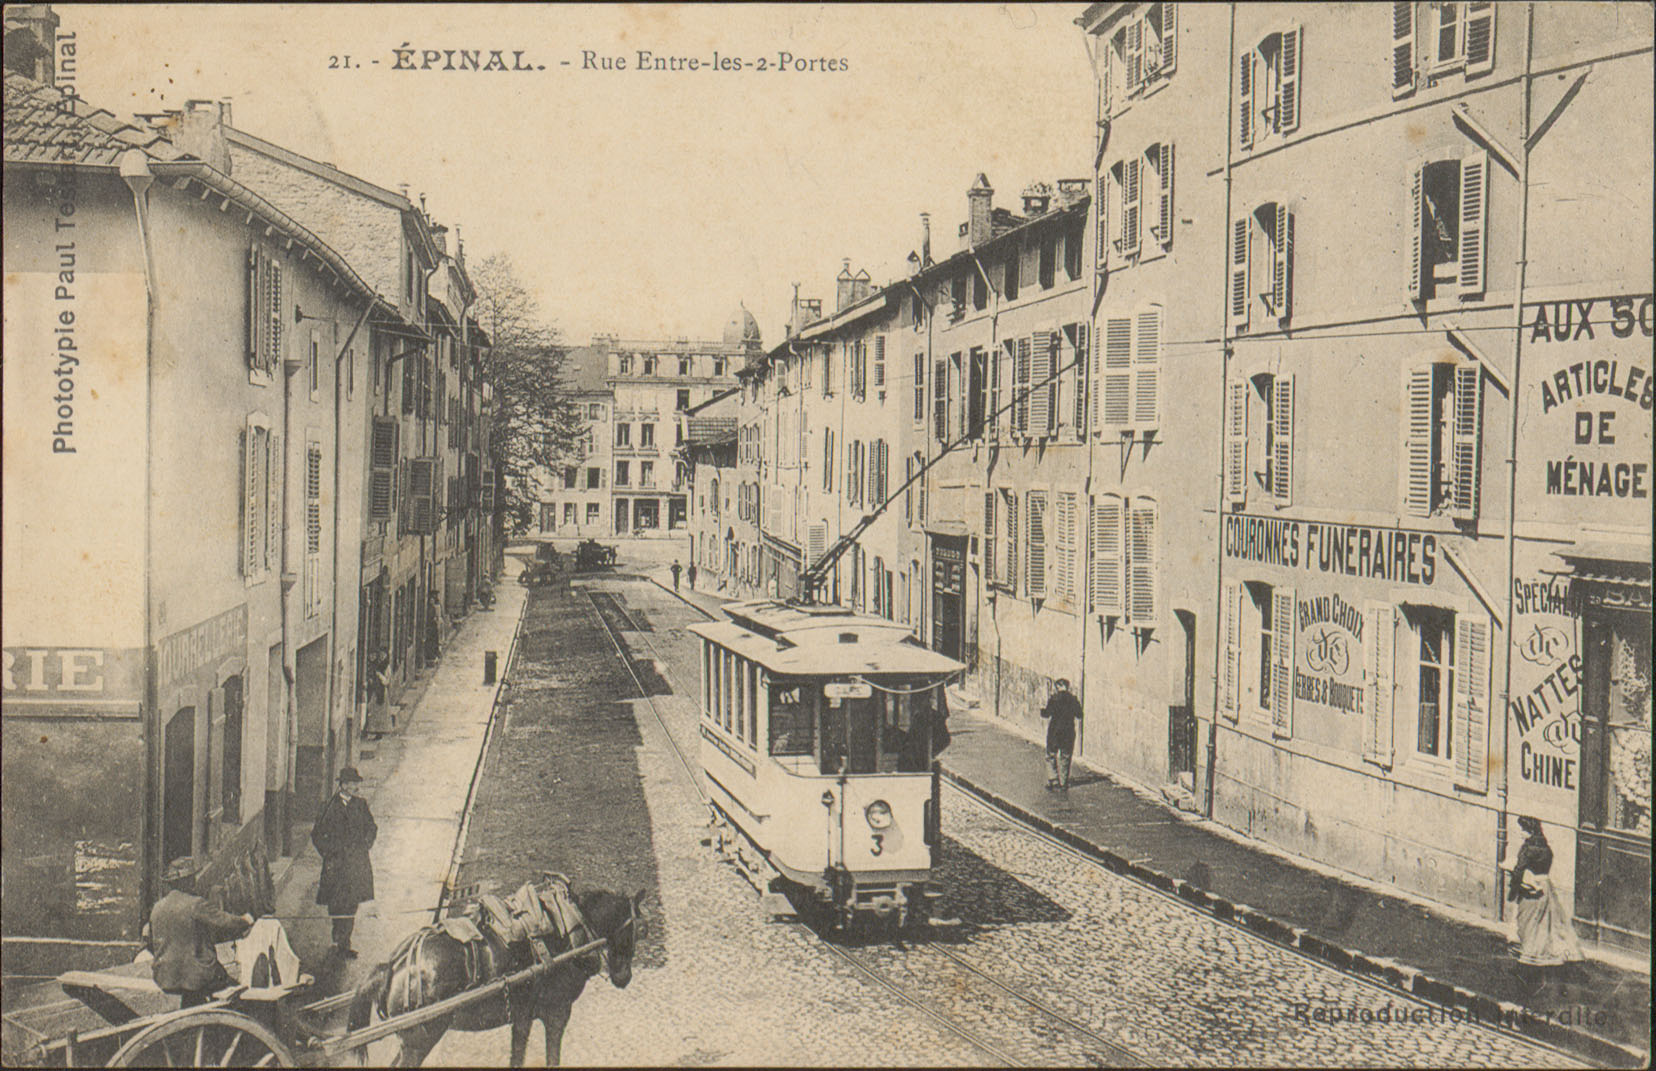 Contenu du Épinal, Rue Entre-les-2-Portes